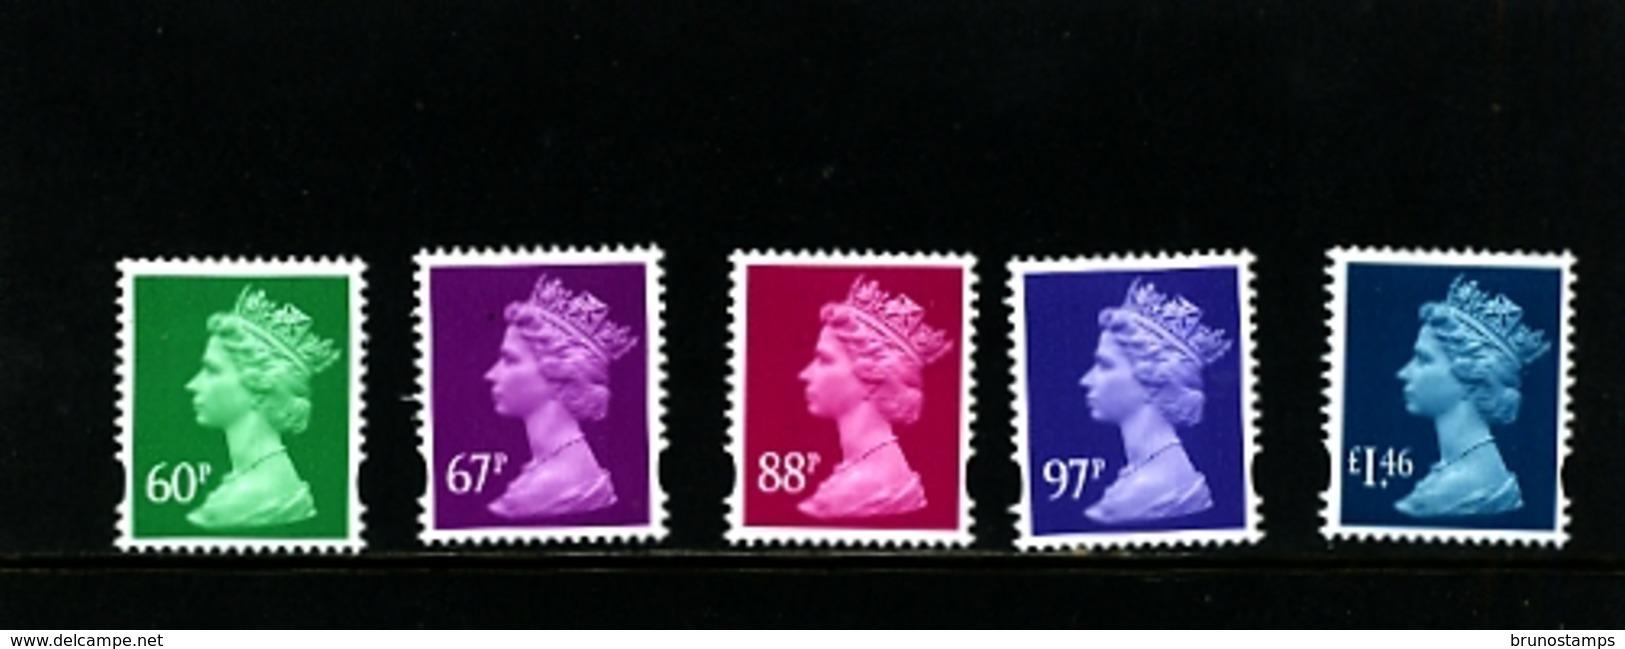 GREAT BRITAIN - 2010  MACHIN  SET  MINT NH - 1952-.... (Elisabetta II)